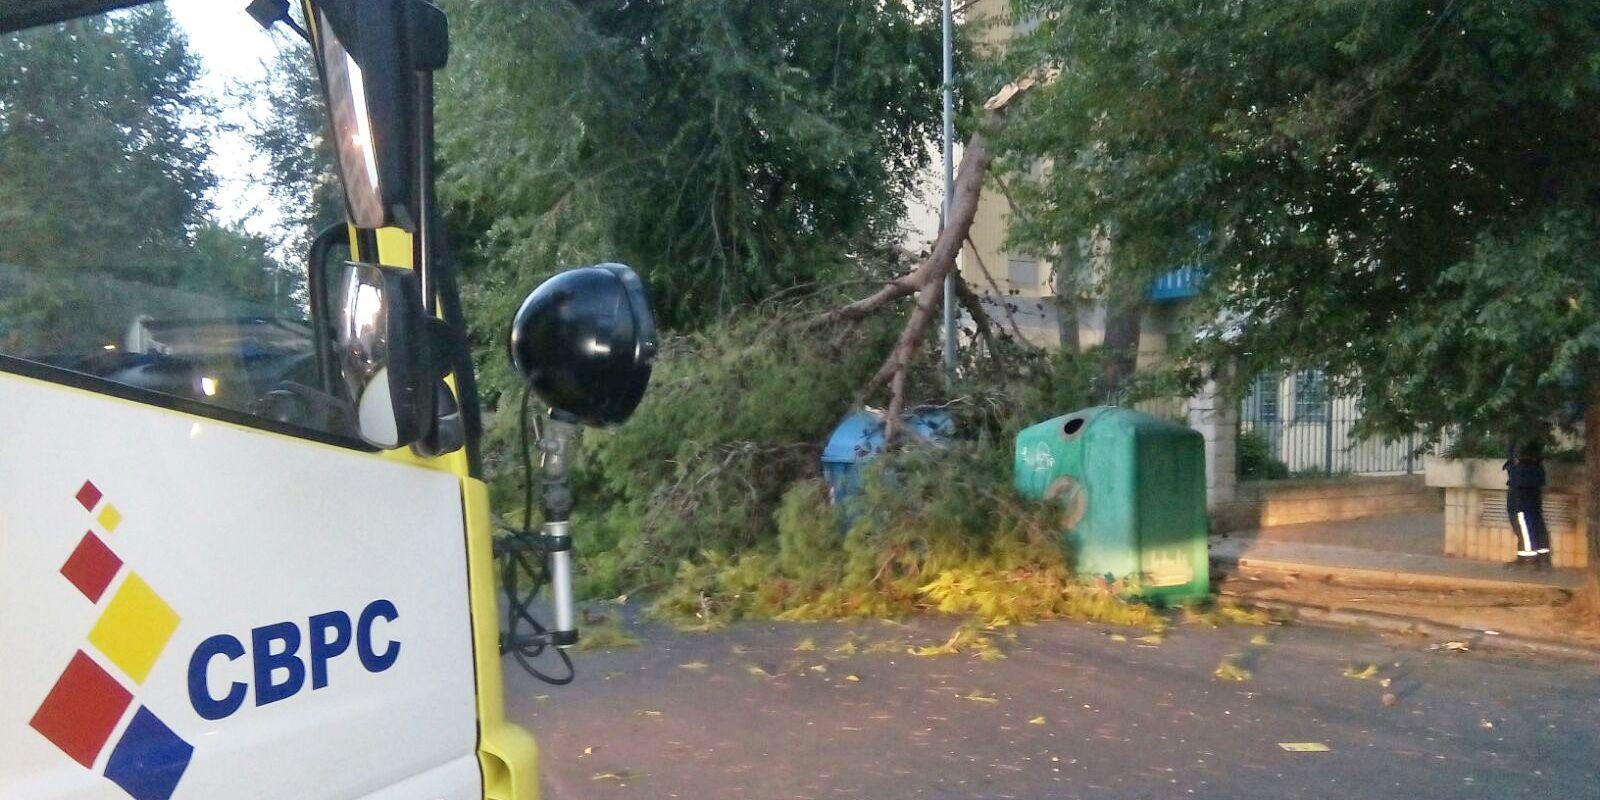 rama arbol caida en Jerez 2